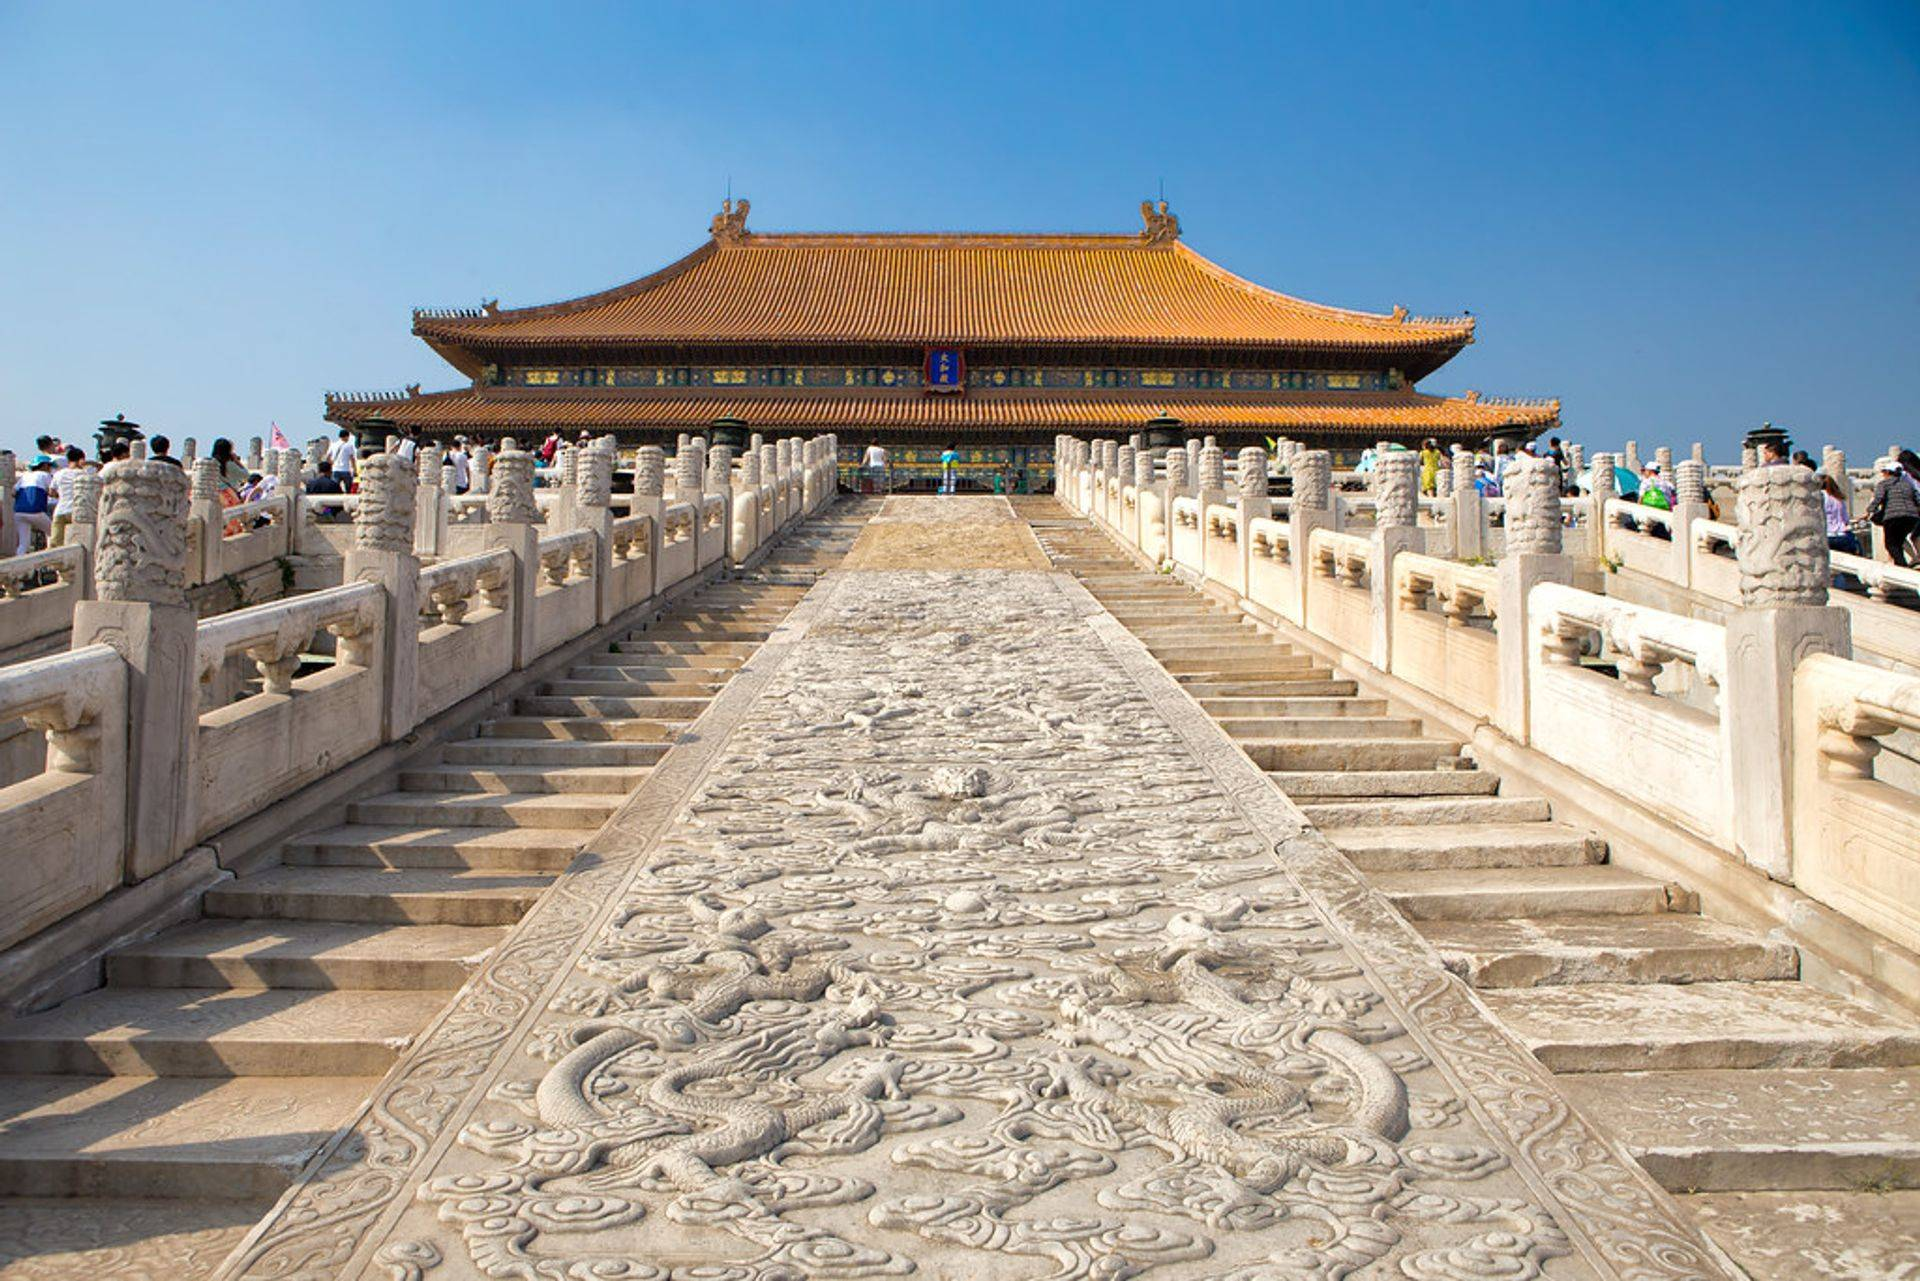 Walkway to Hall of Supreme Harmony